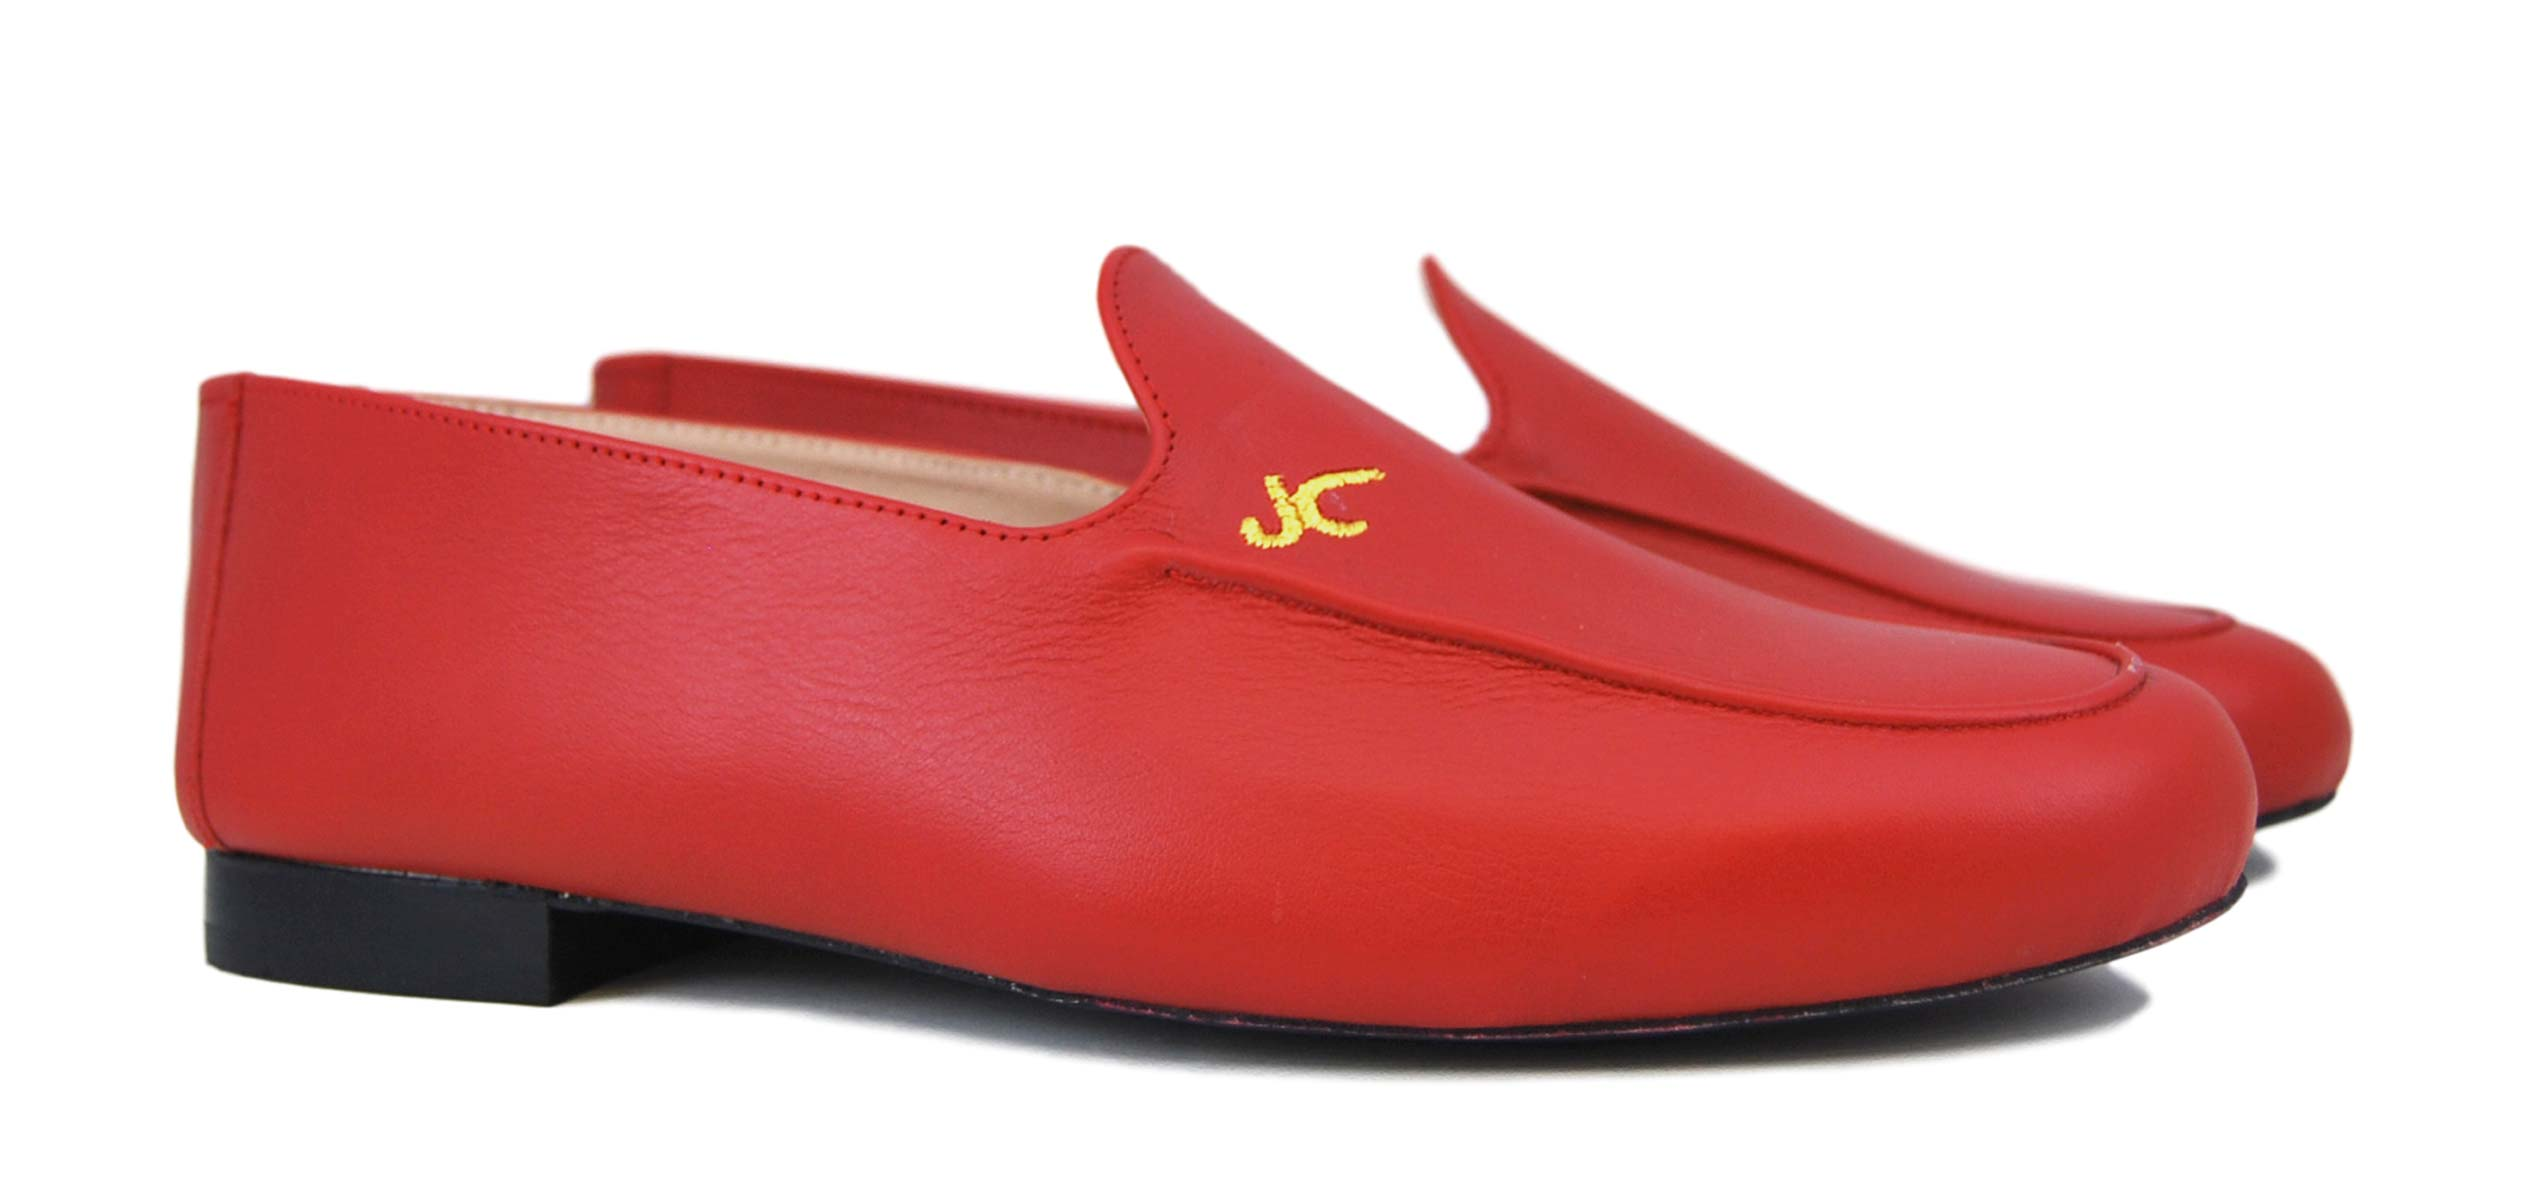 Foto 5 de Zapatos Julio Iglesias Mocasin 528 JC Rojo Napa